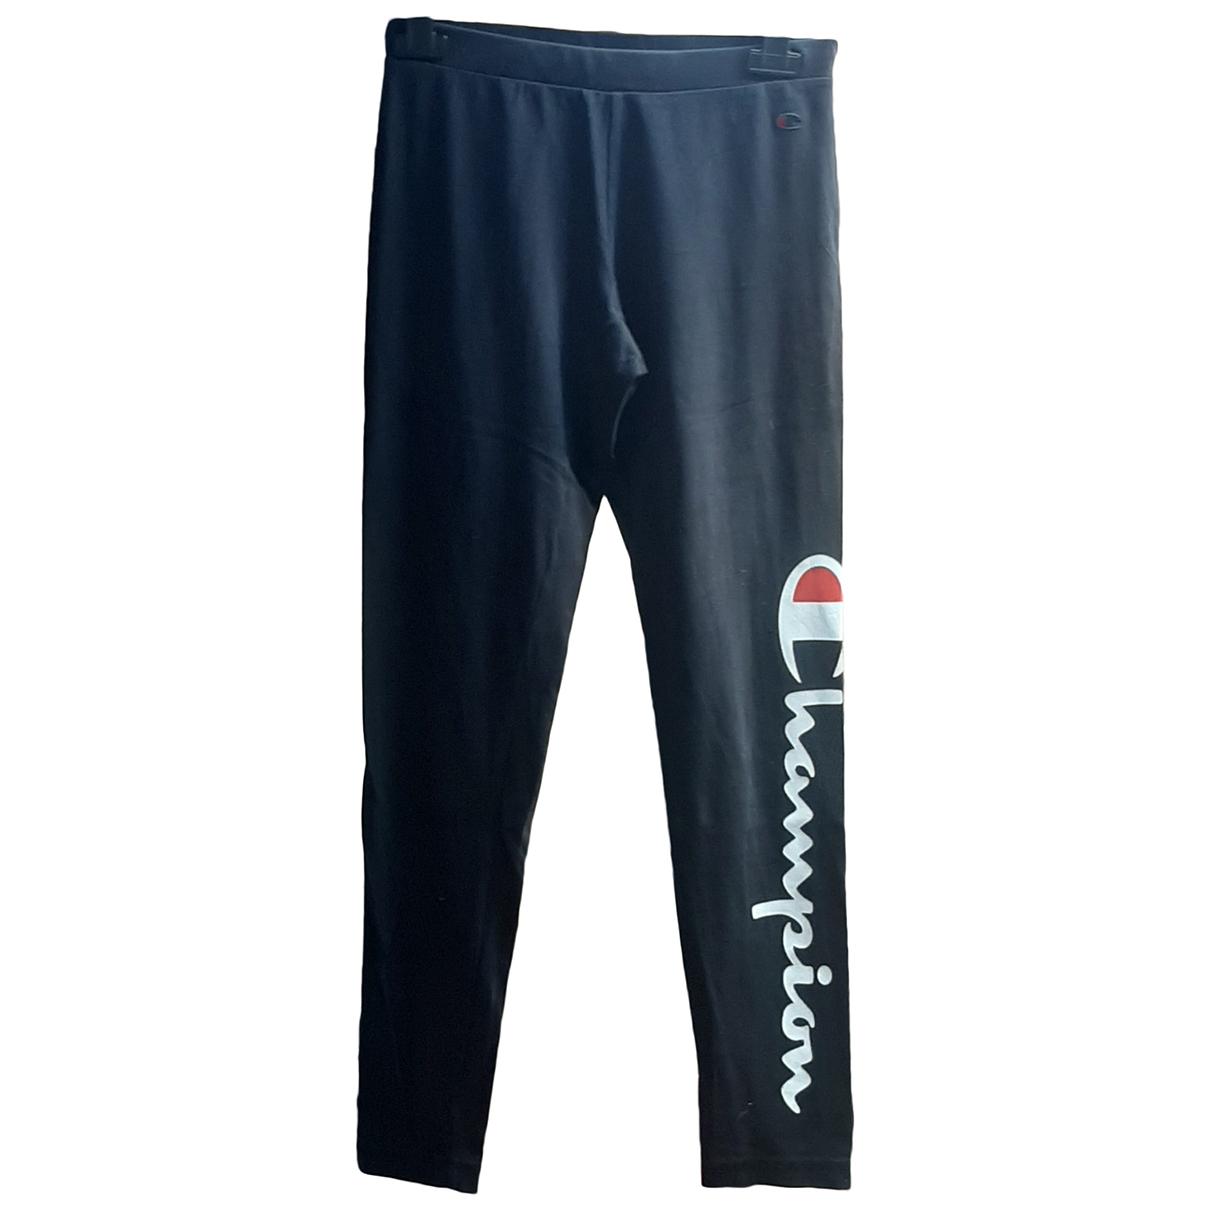 Champion \N Black Cotton Trousers for Women S International